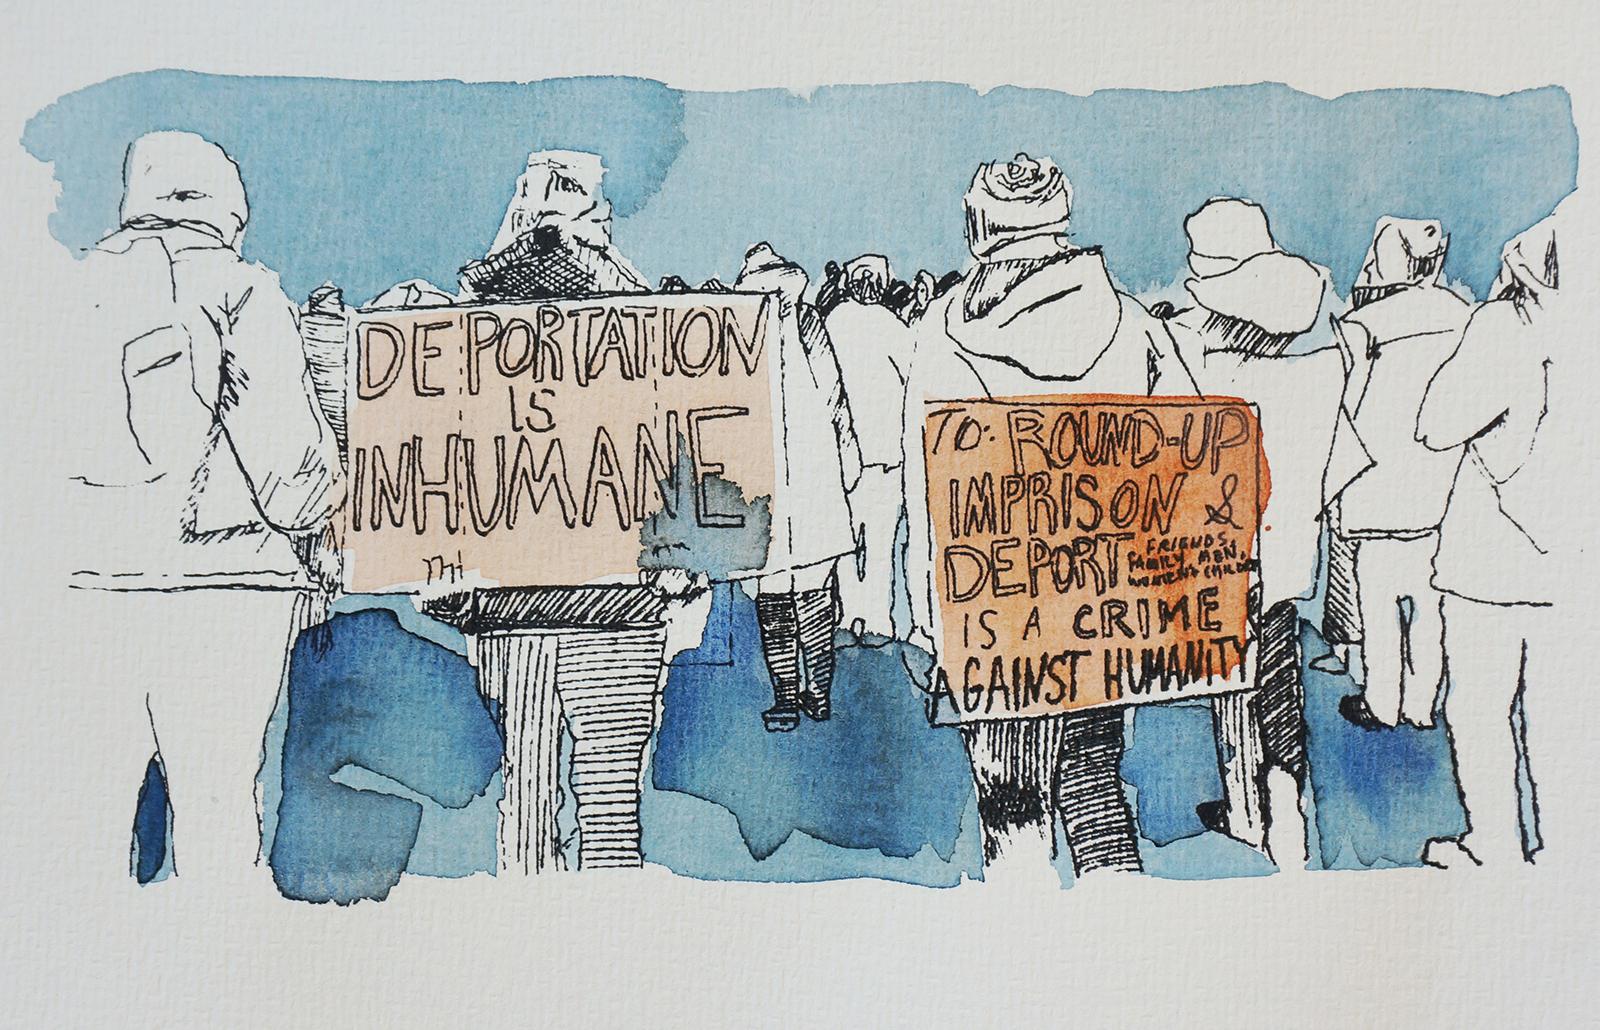 Ape_Bleakney_March Mixed Media - 'Inhumane (8)', 6.5''x9.5'', Screen Print + Watercolor, 2018 copy.jpg